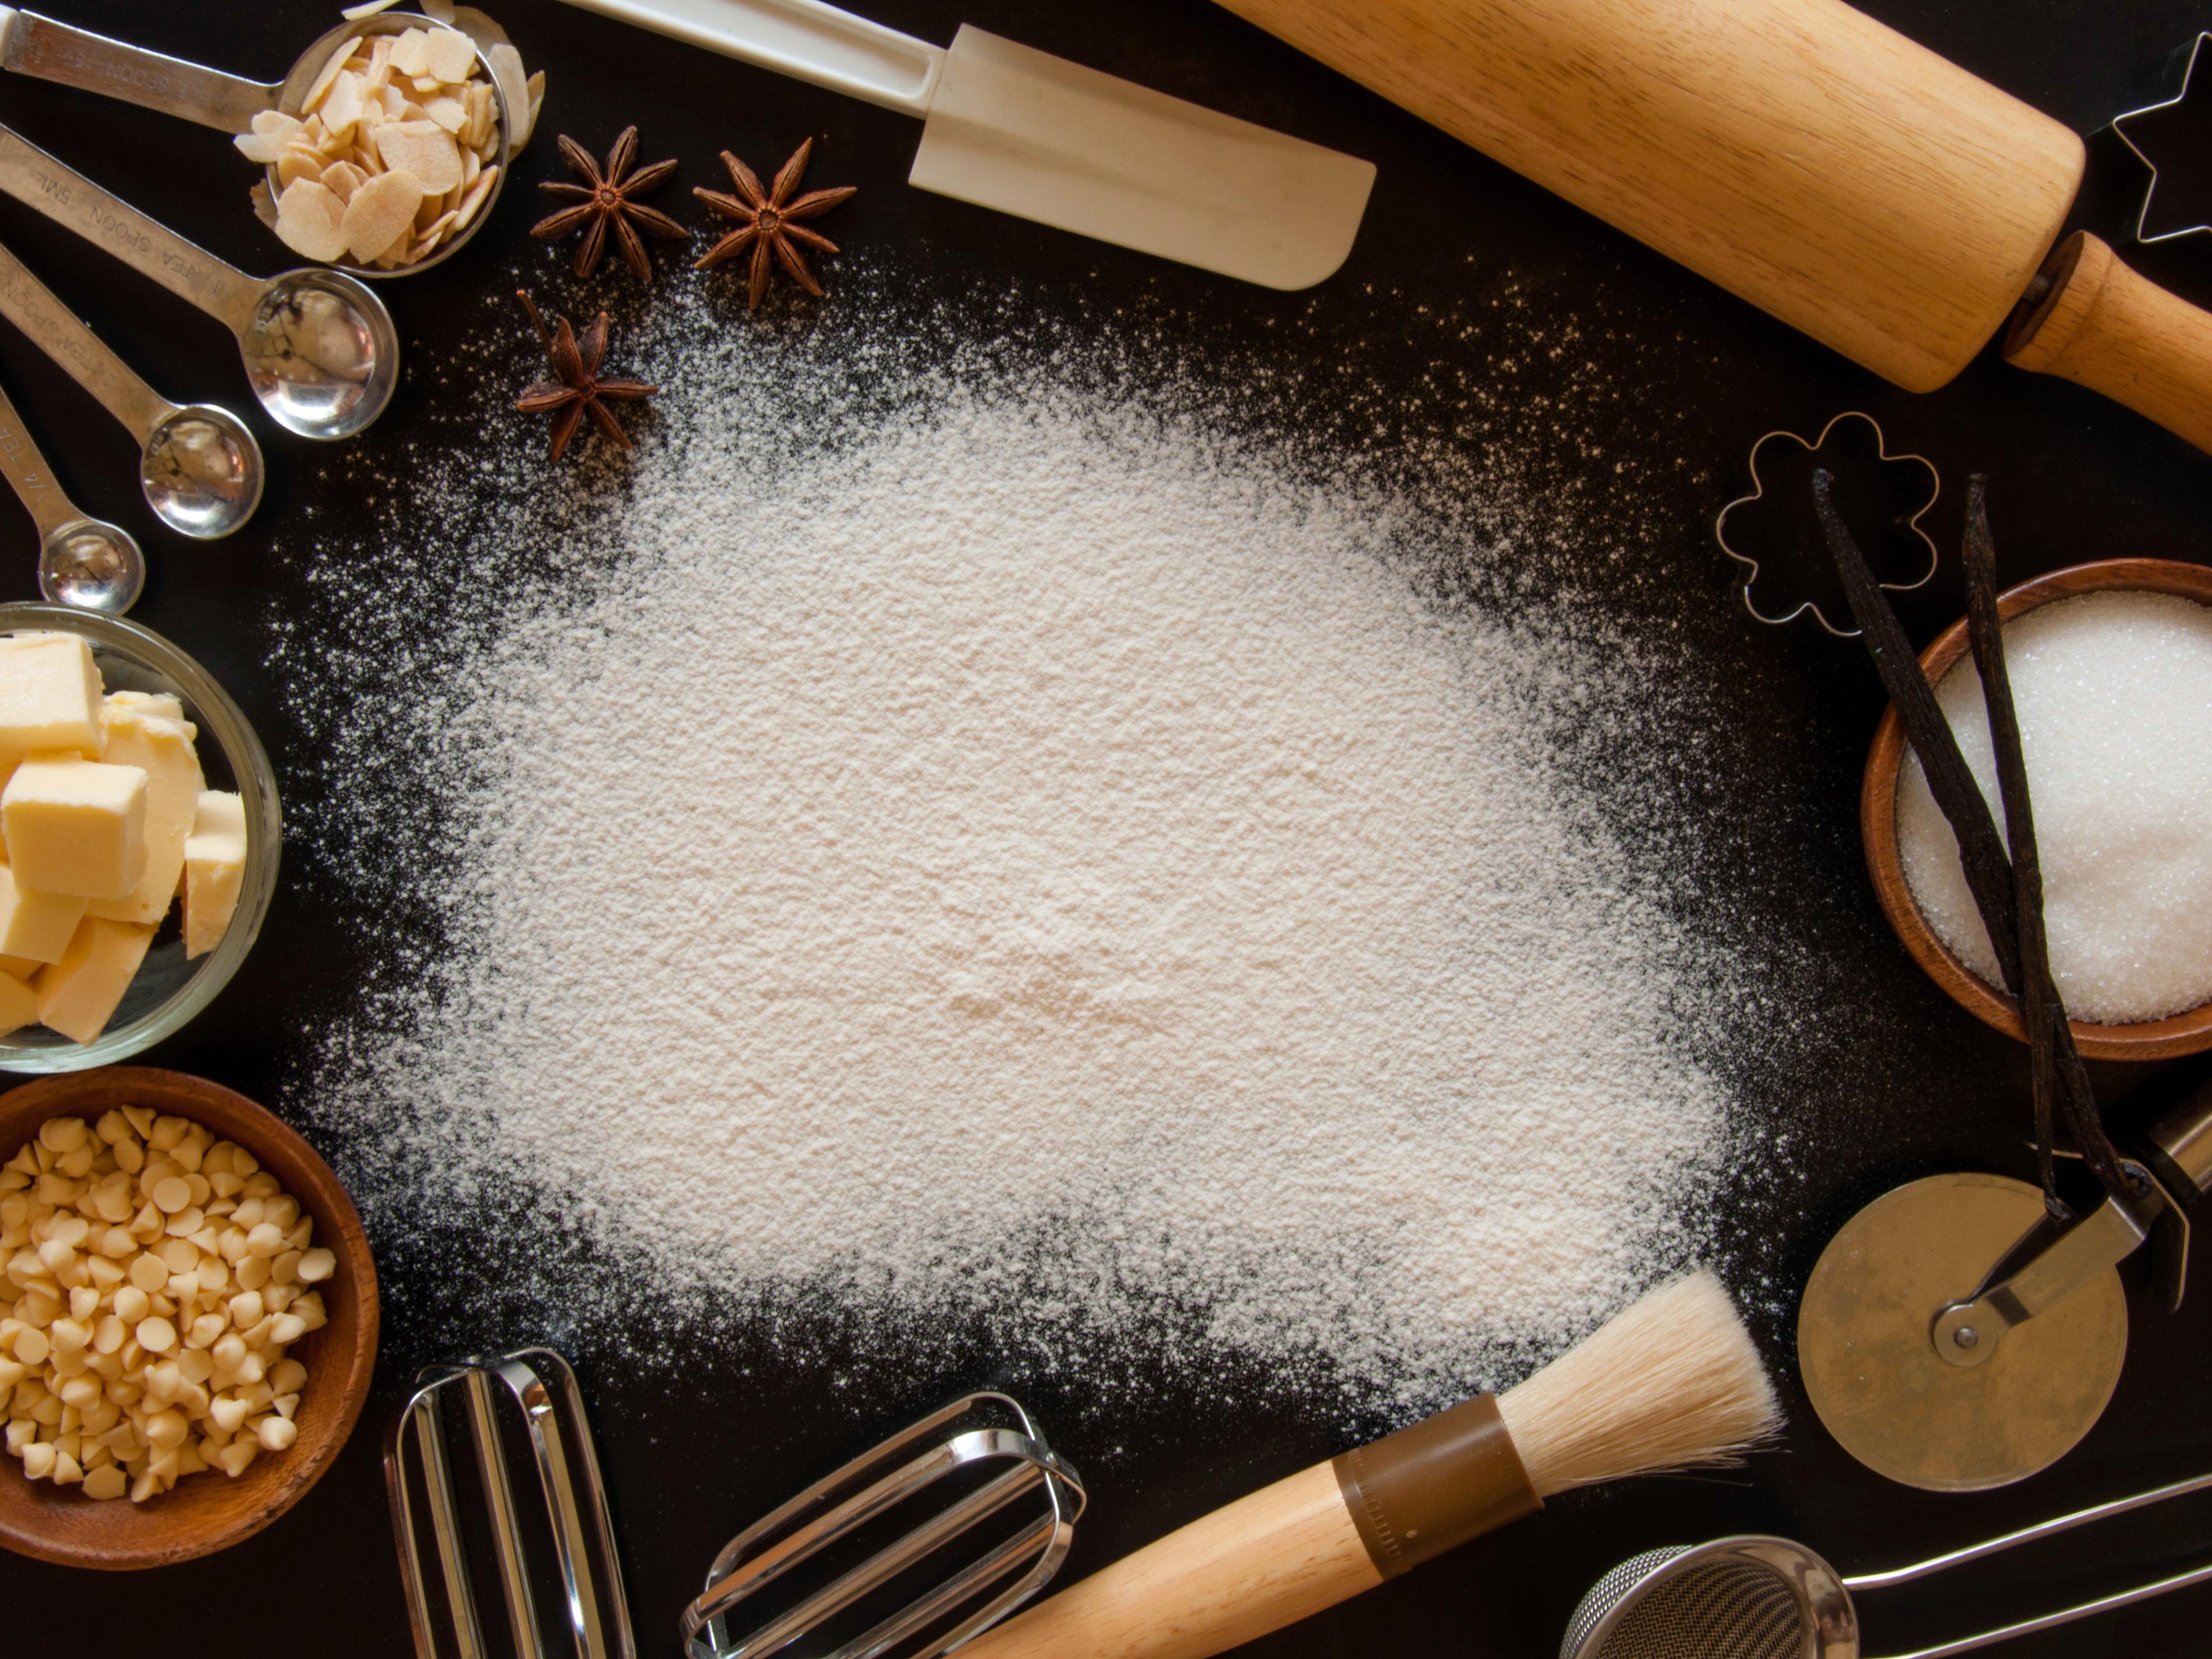 fn_baking-tools-thinkstock_s4x3